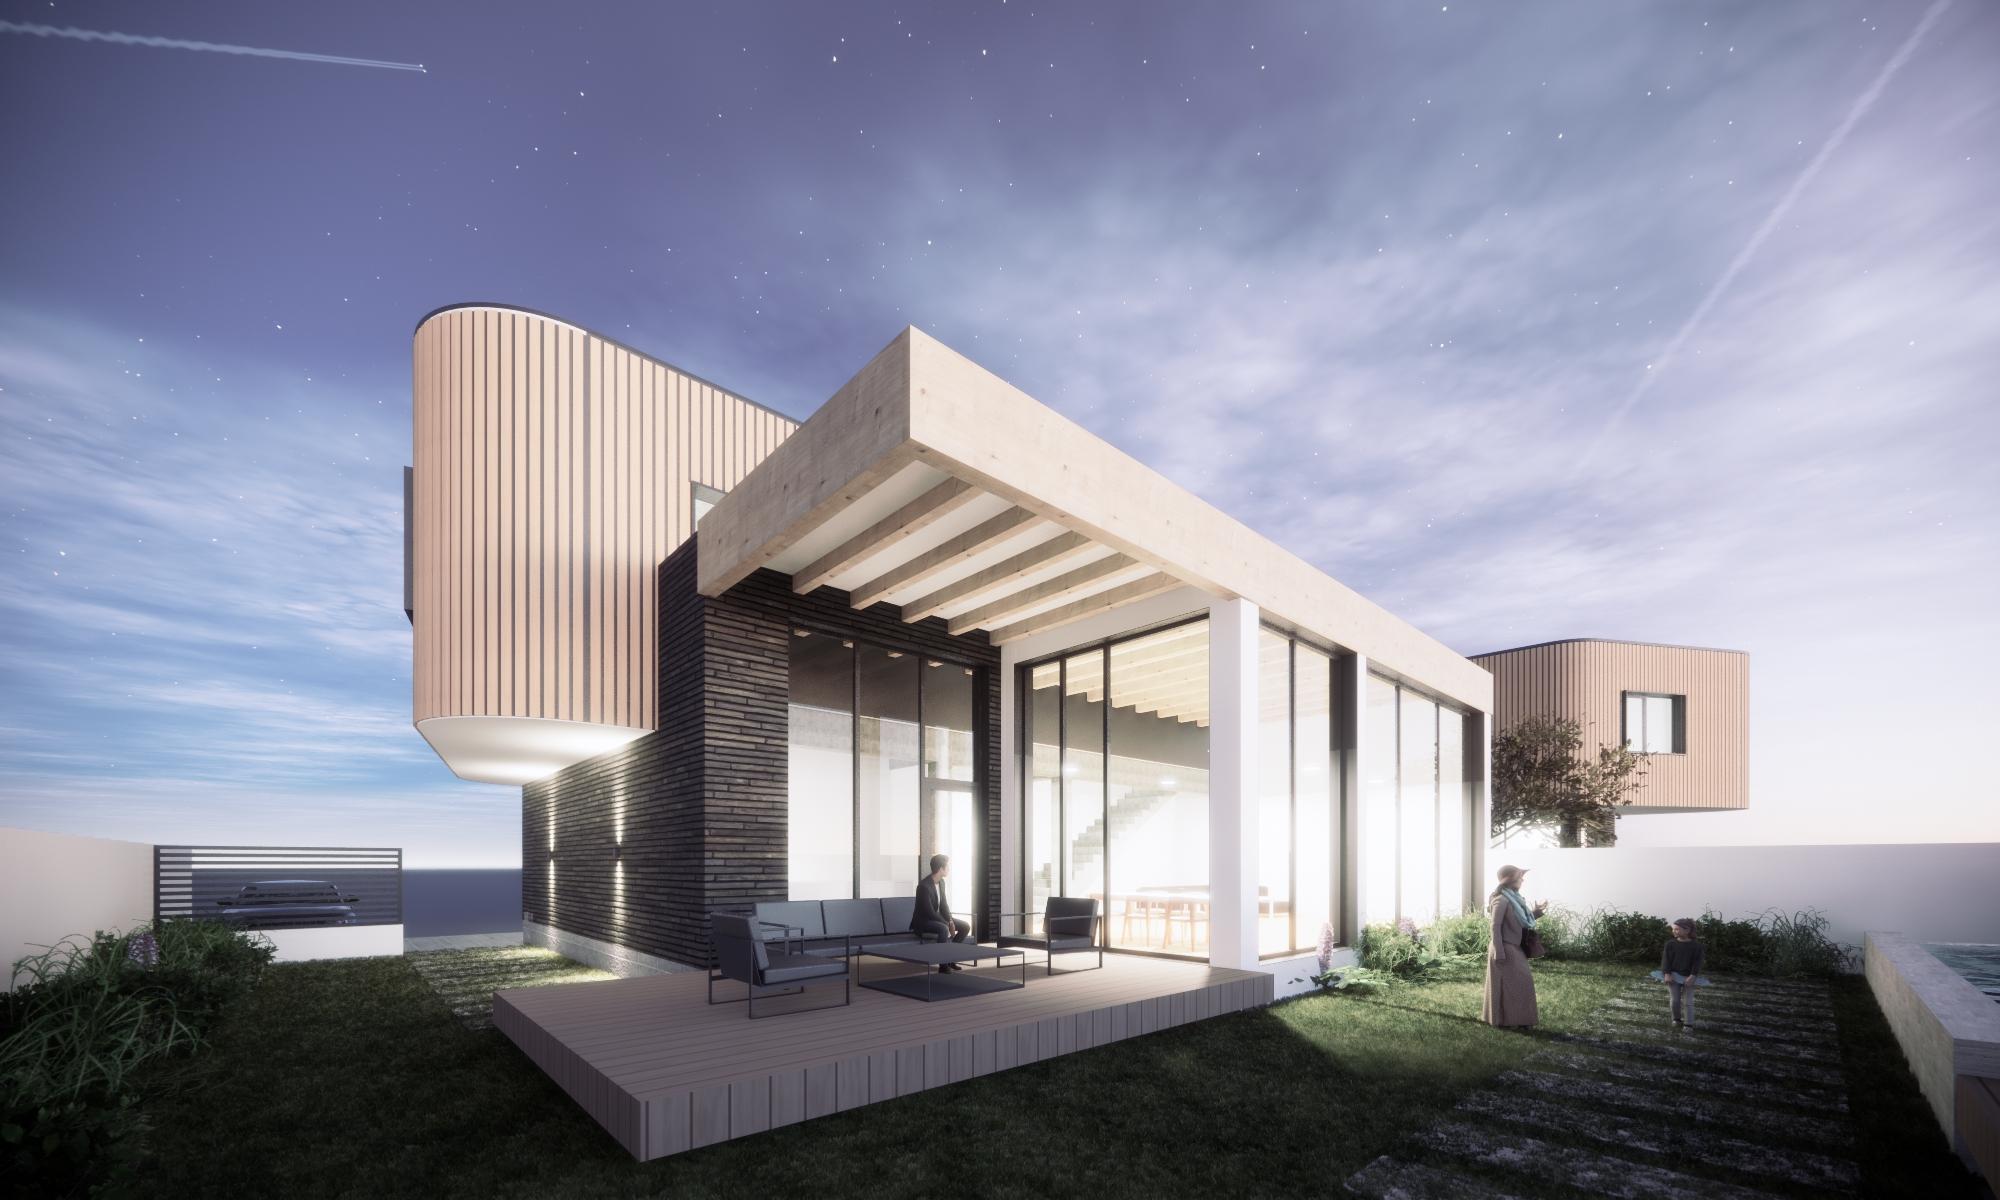 https://nbc-arhitect.ro/wp-content/uploads/2020/10/NBC-Arhitect-_-R-Zoo-_-Romania-_-exterior-view_12.jpg